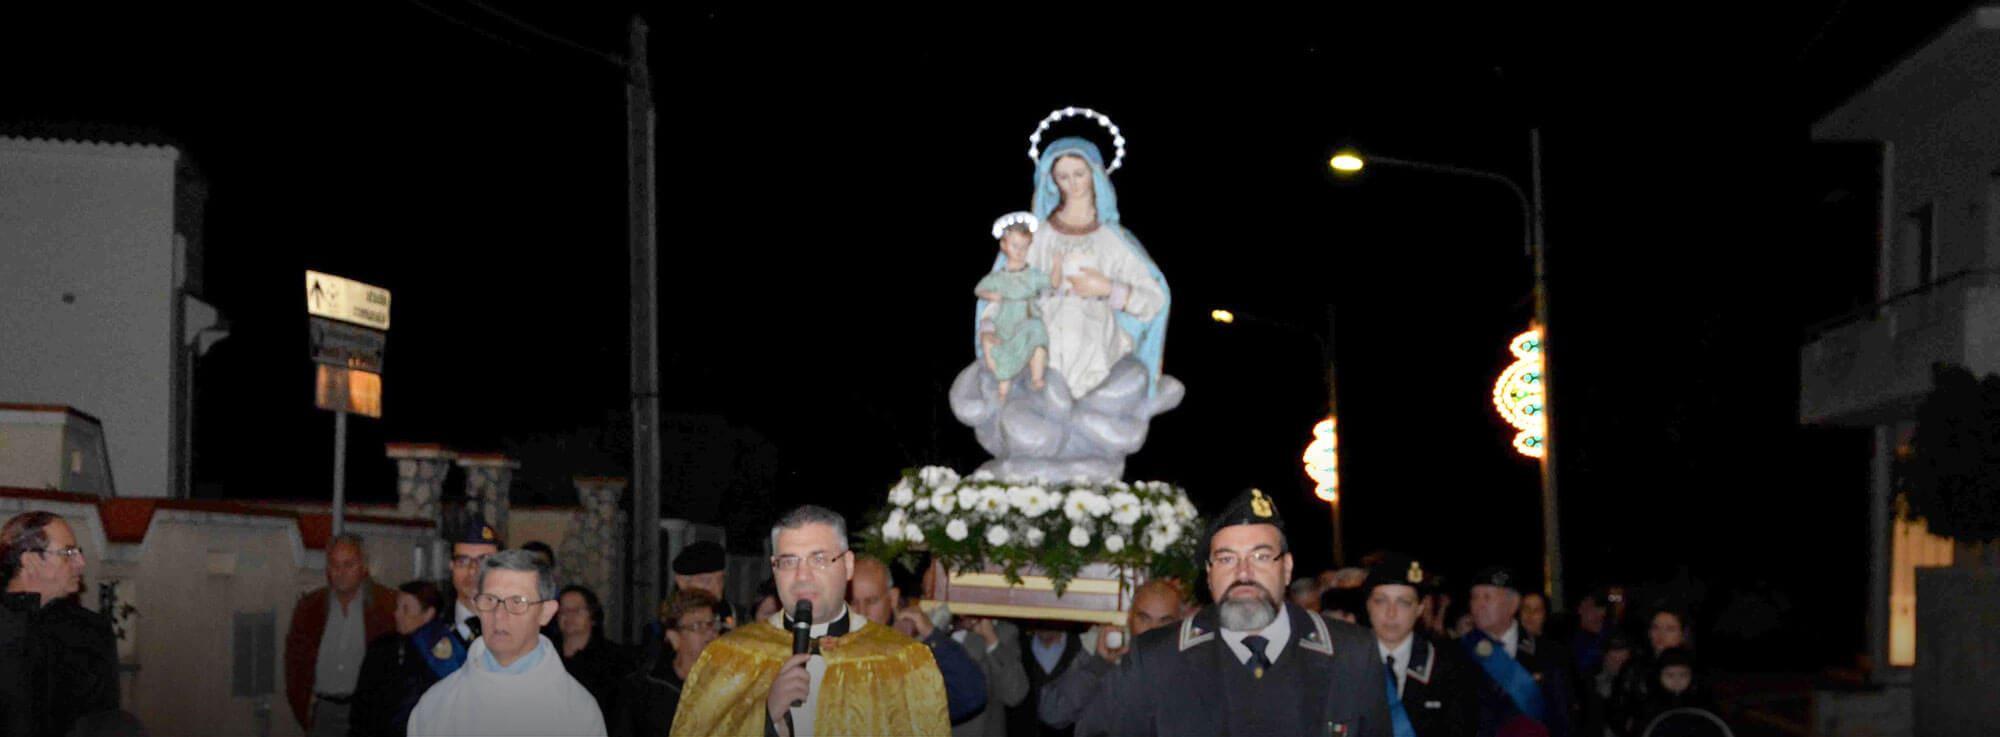 Maruggio: Festa della Madonna del Verde